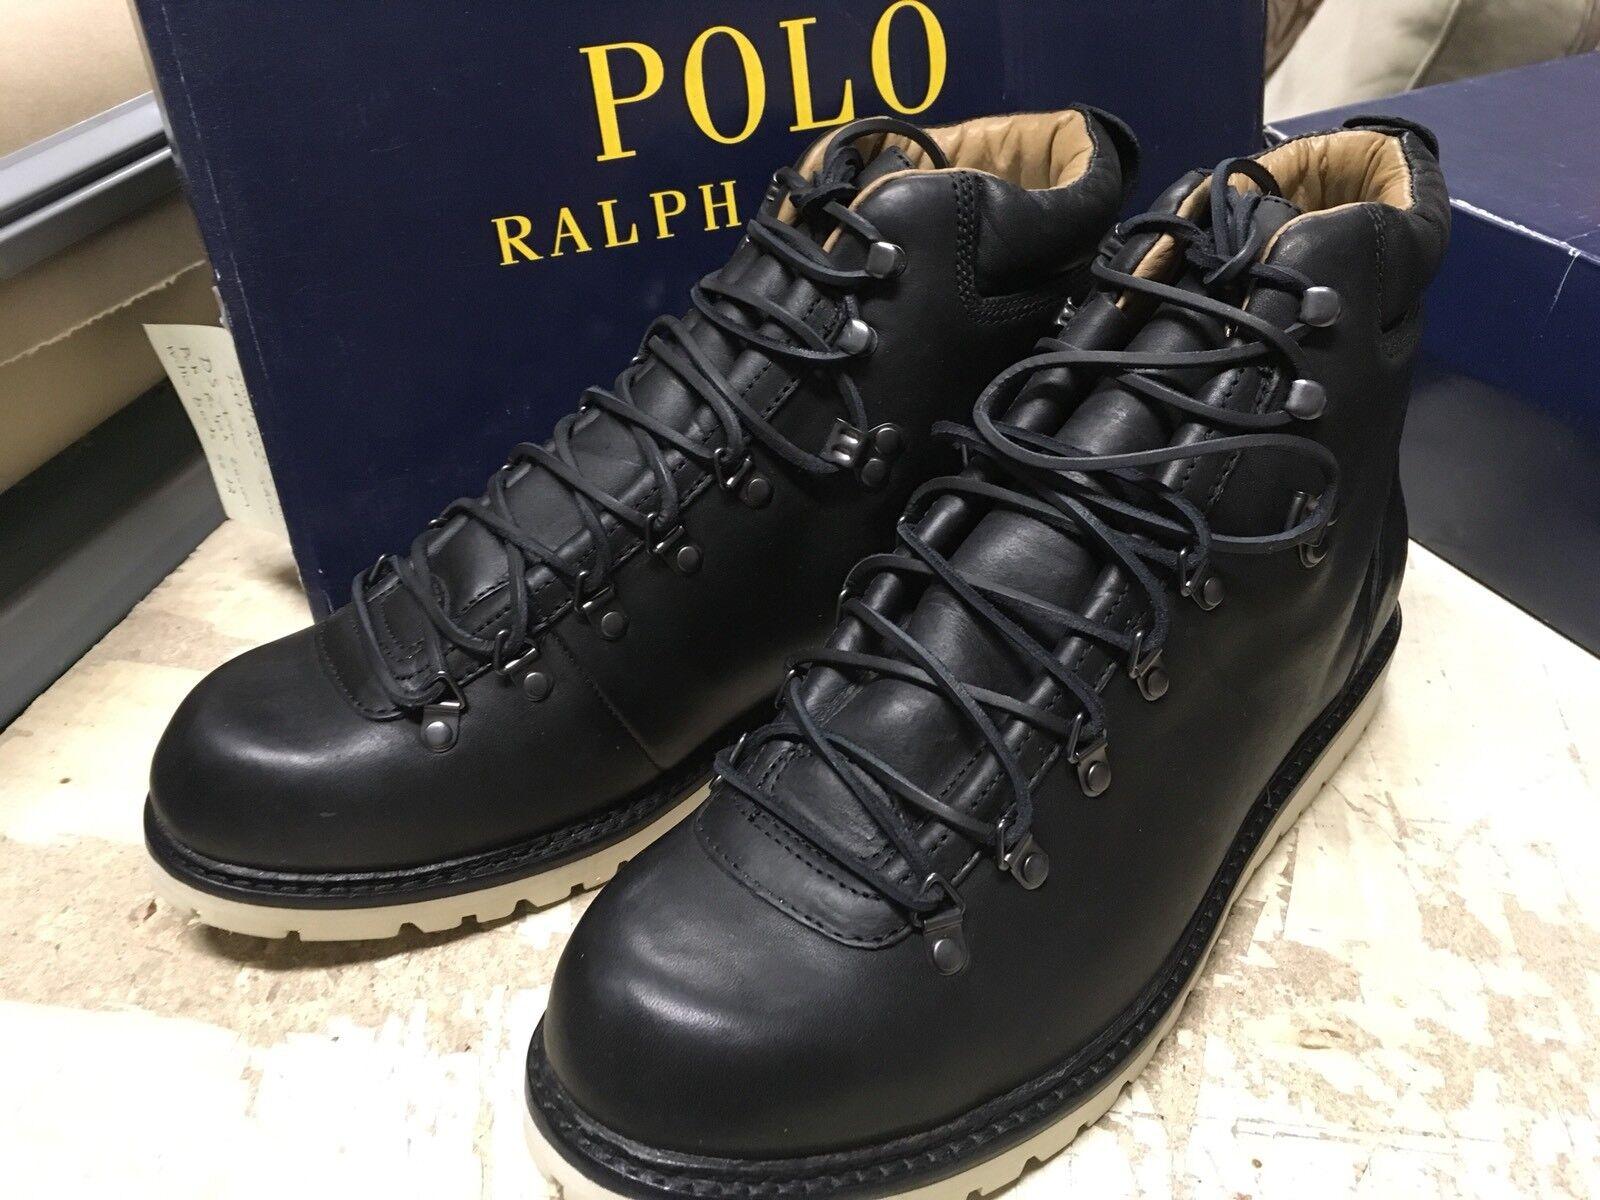 NIB Polo Polo NIB Ralph Lauren Uomo WILLIS BOOTS  BLACK LEATHER SZ 12 D SMALL NICK LEFT fa12d4